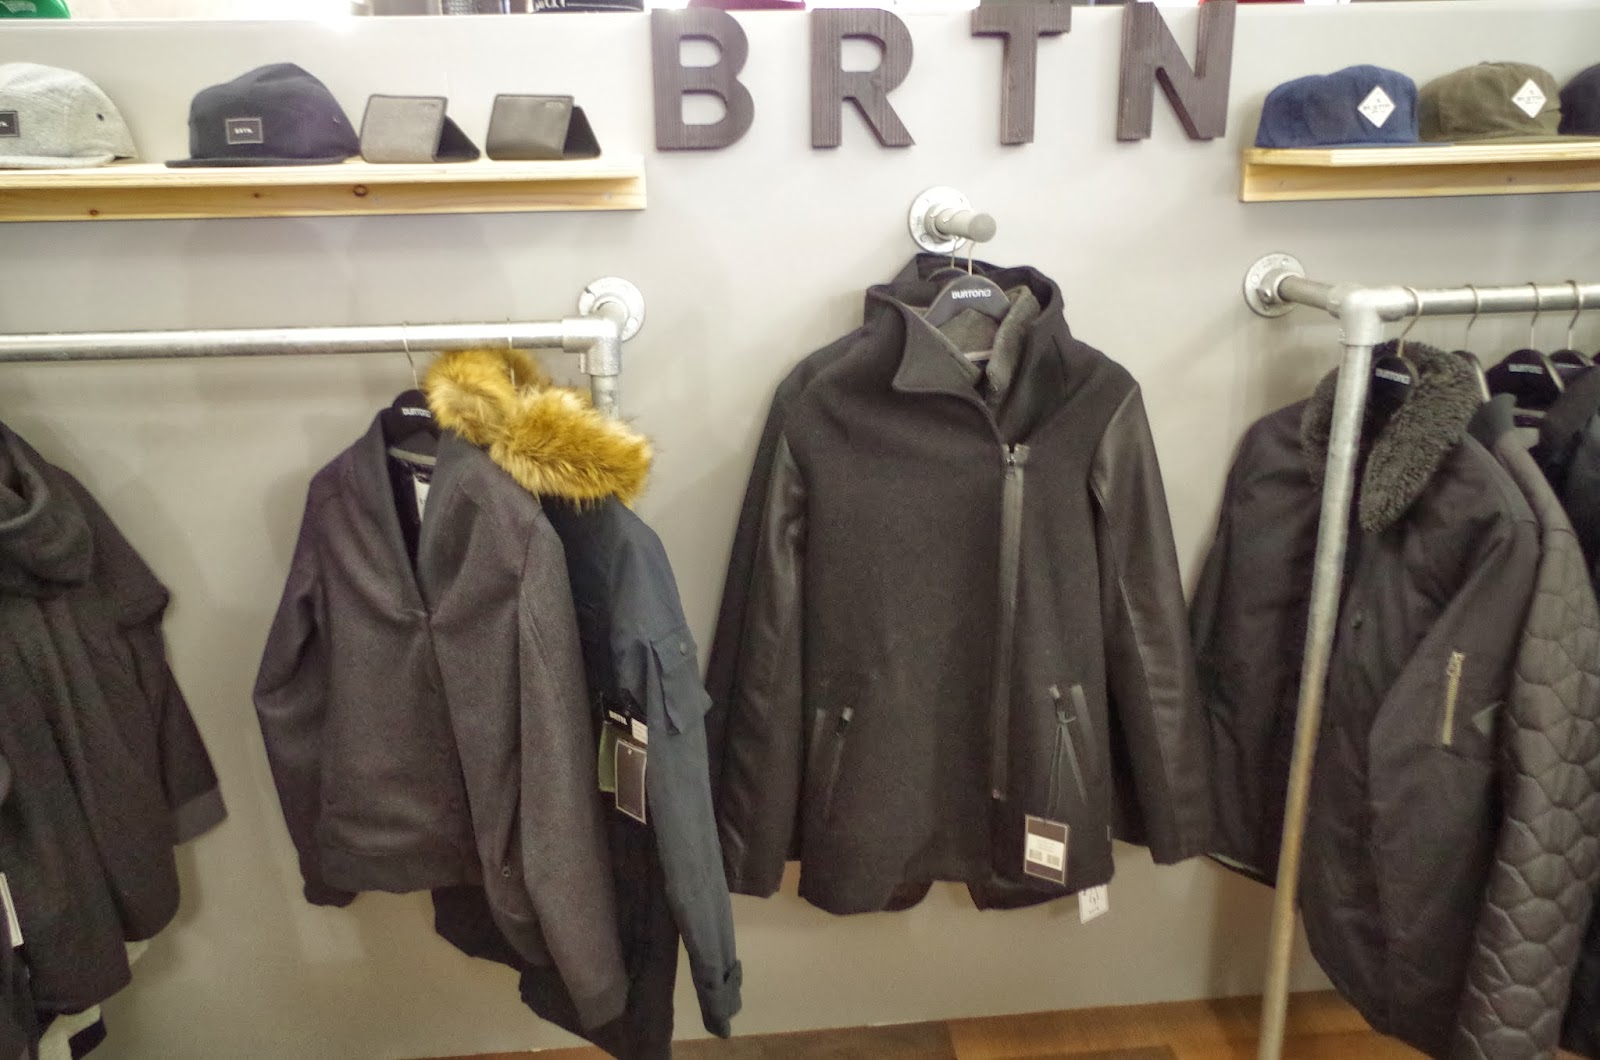 bright_tradeshow_jan_2014_brtn_1.JPG